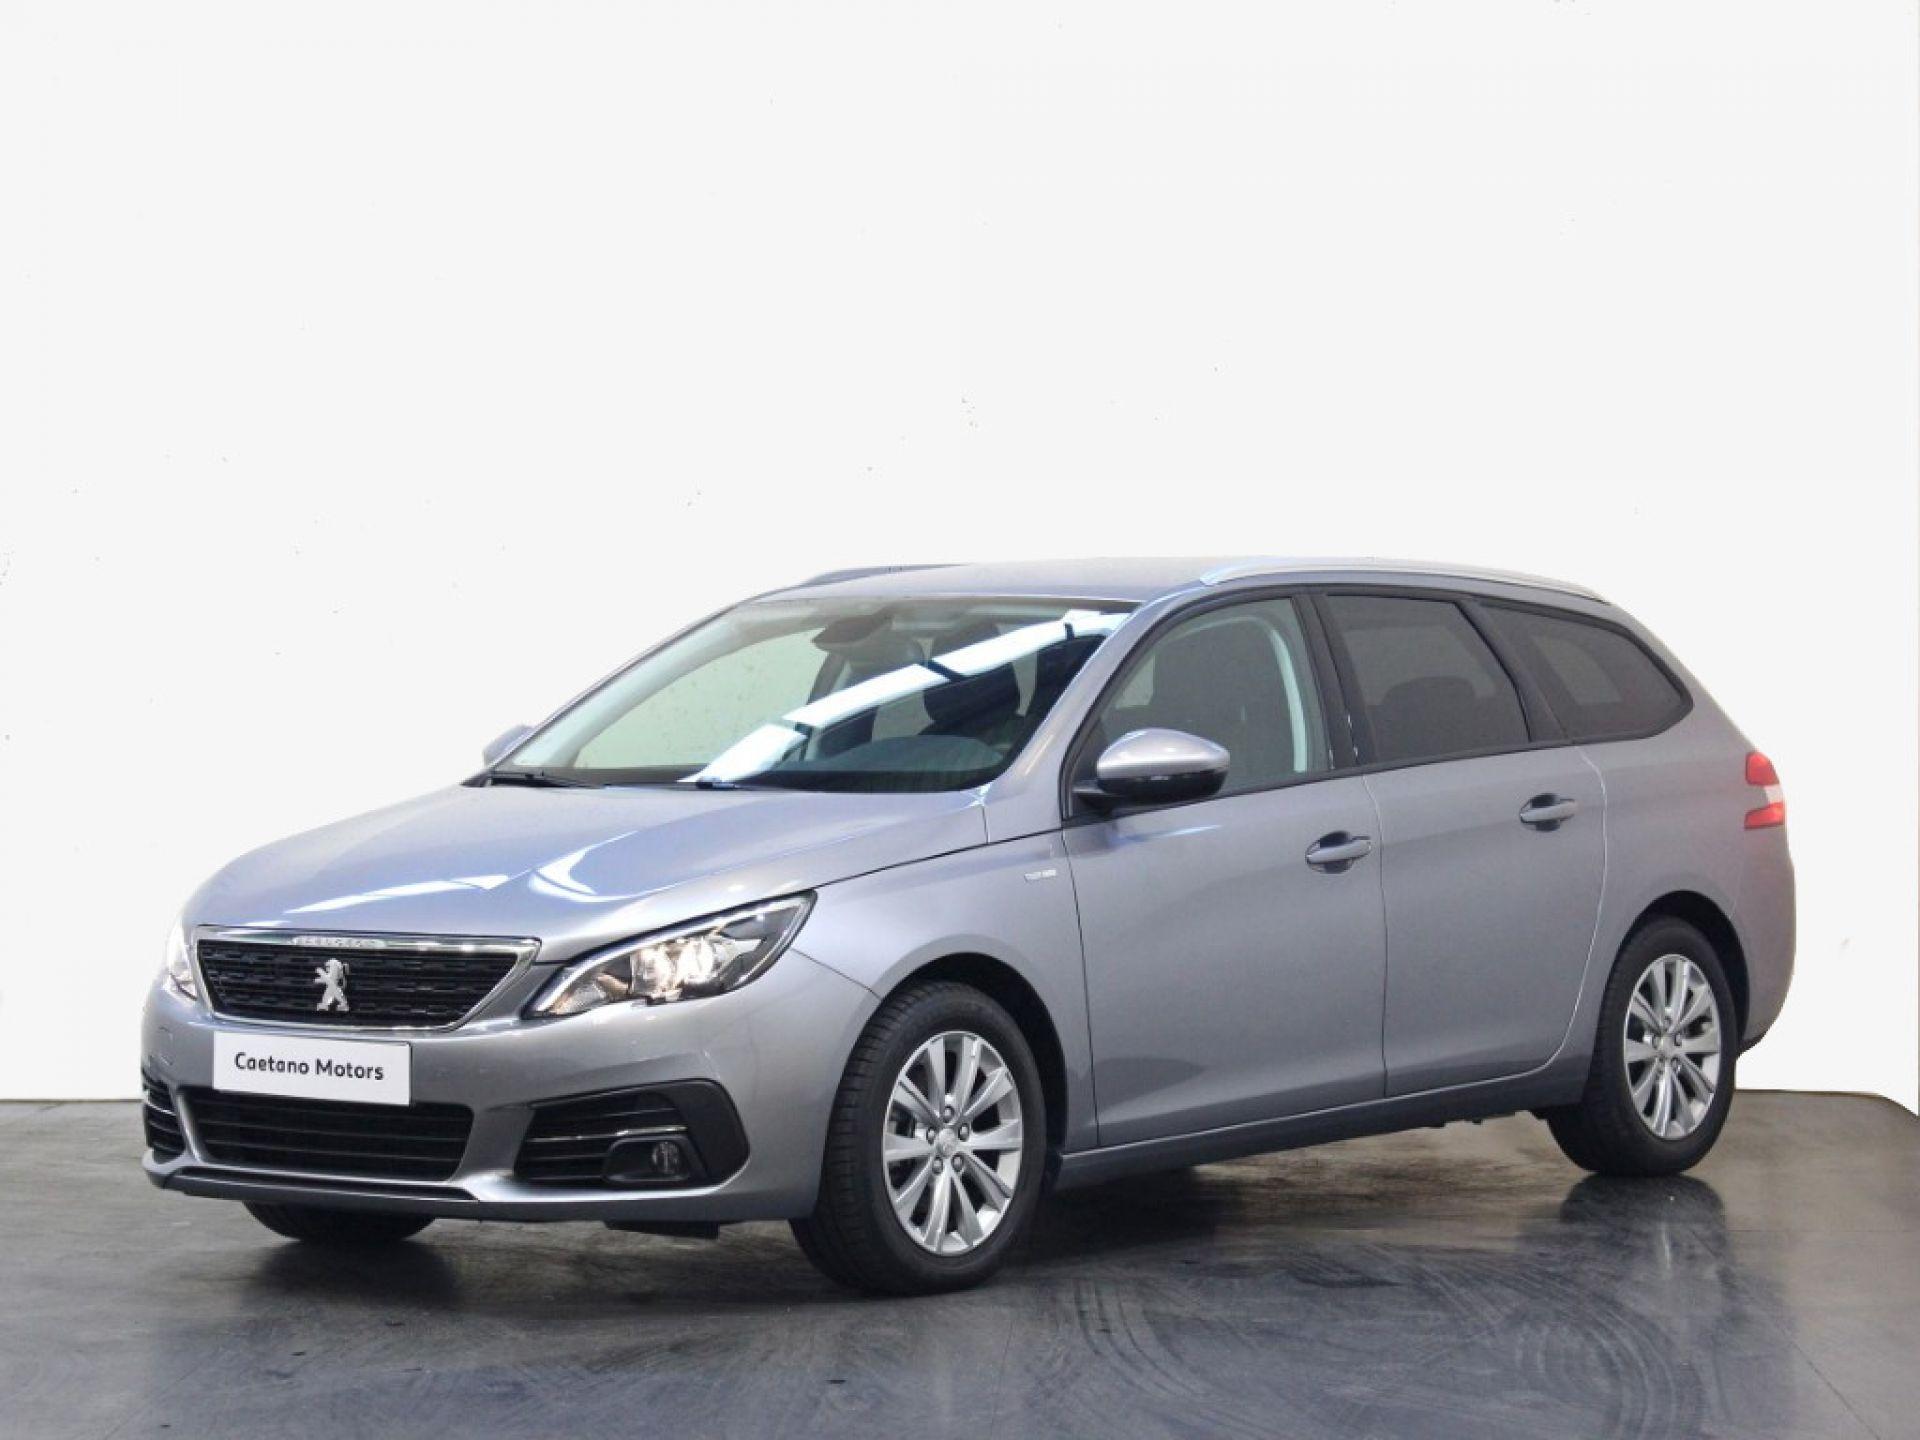 Peugeot 308 SW Style 1.5 BlueHDi 100cv Eu 6.2d CVM6 SW usada Porto